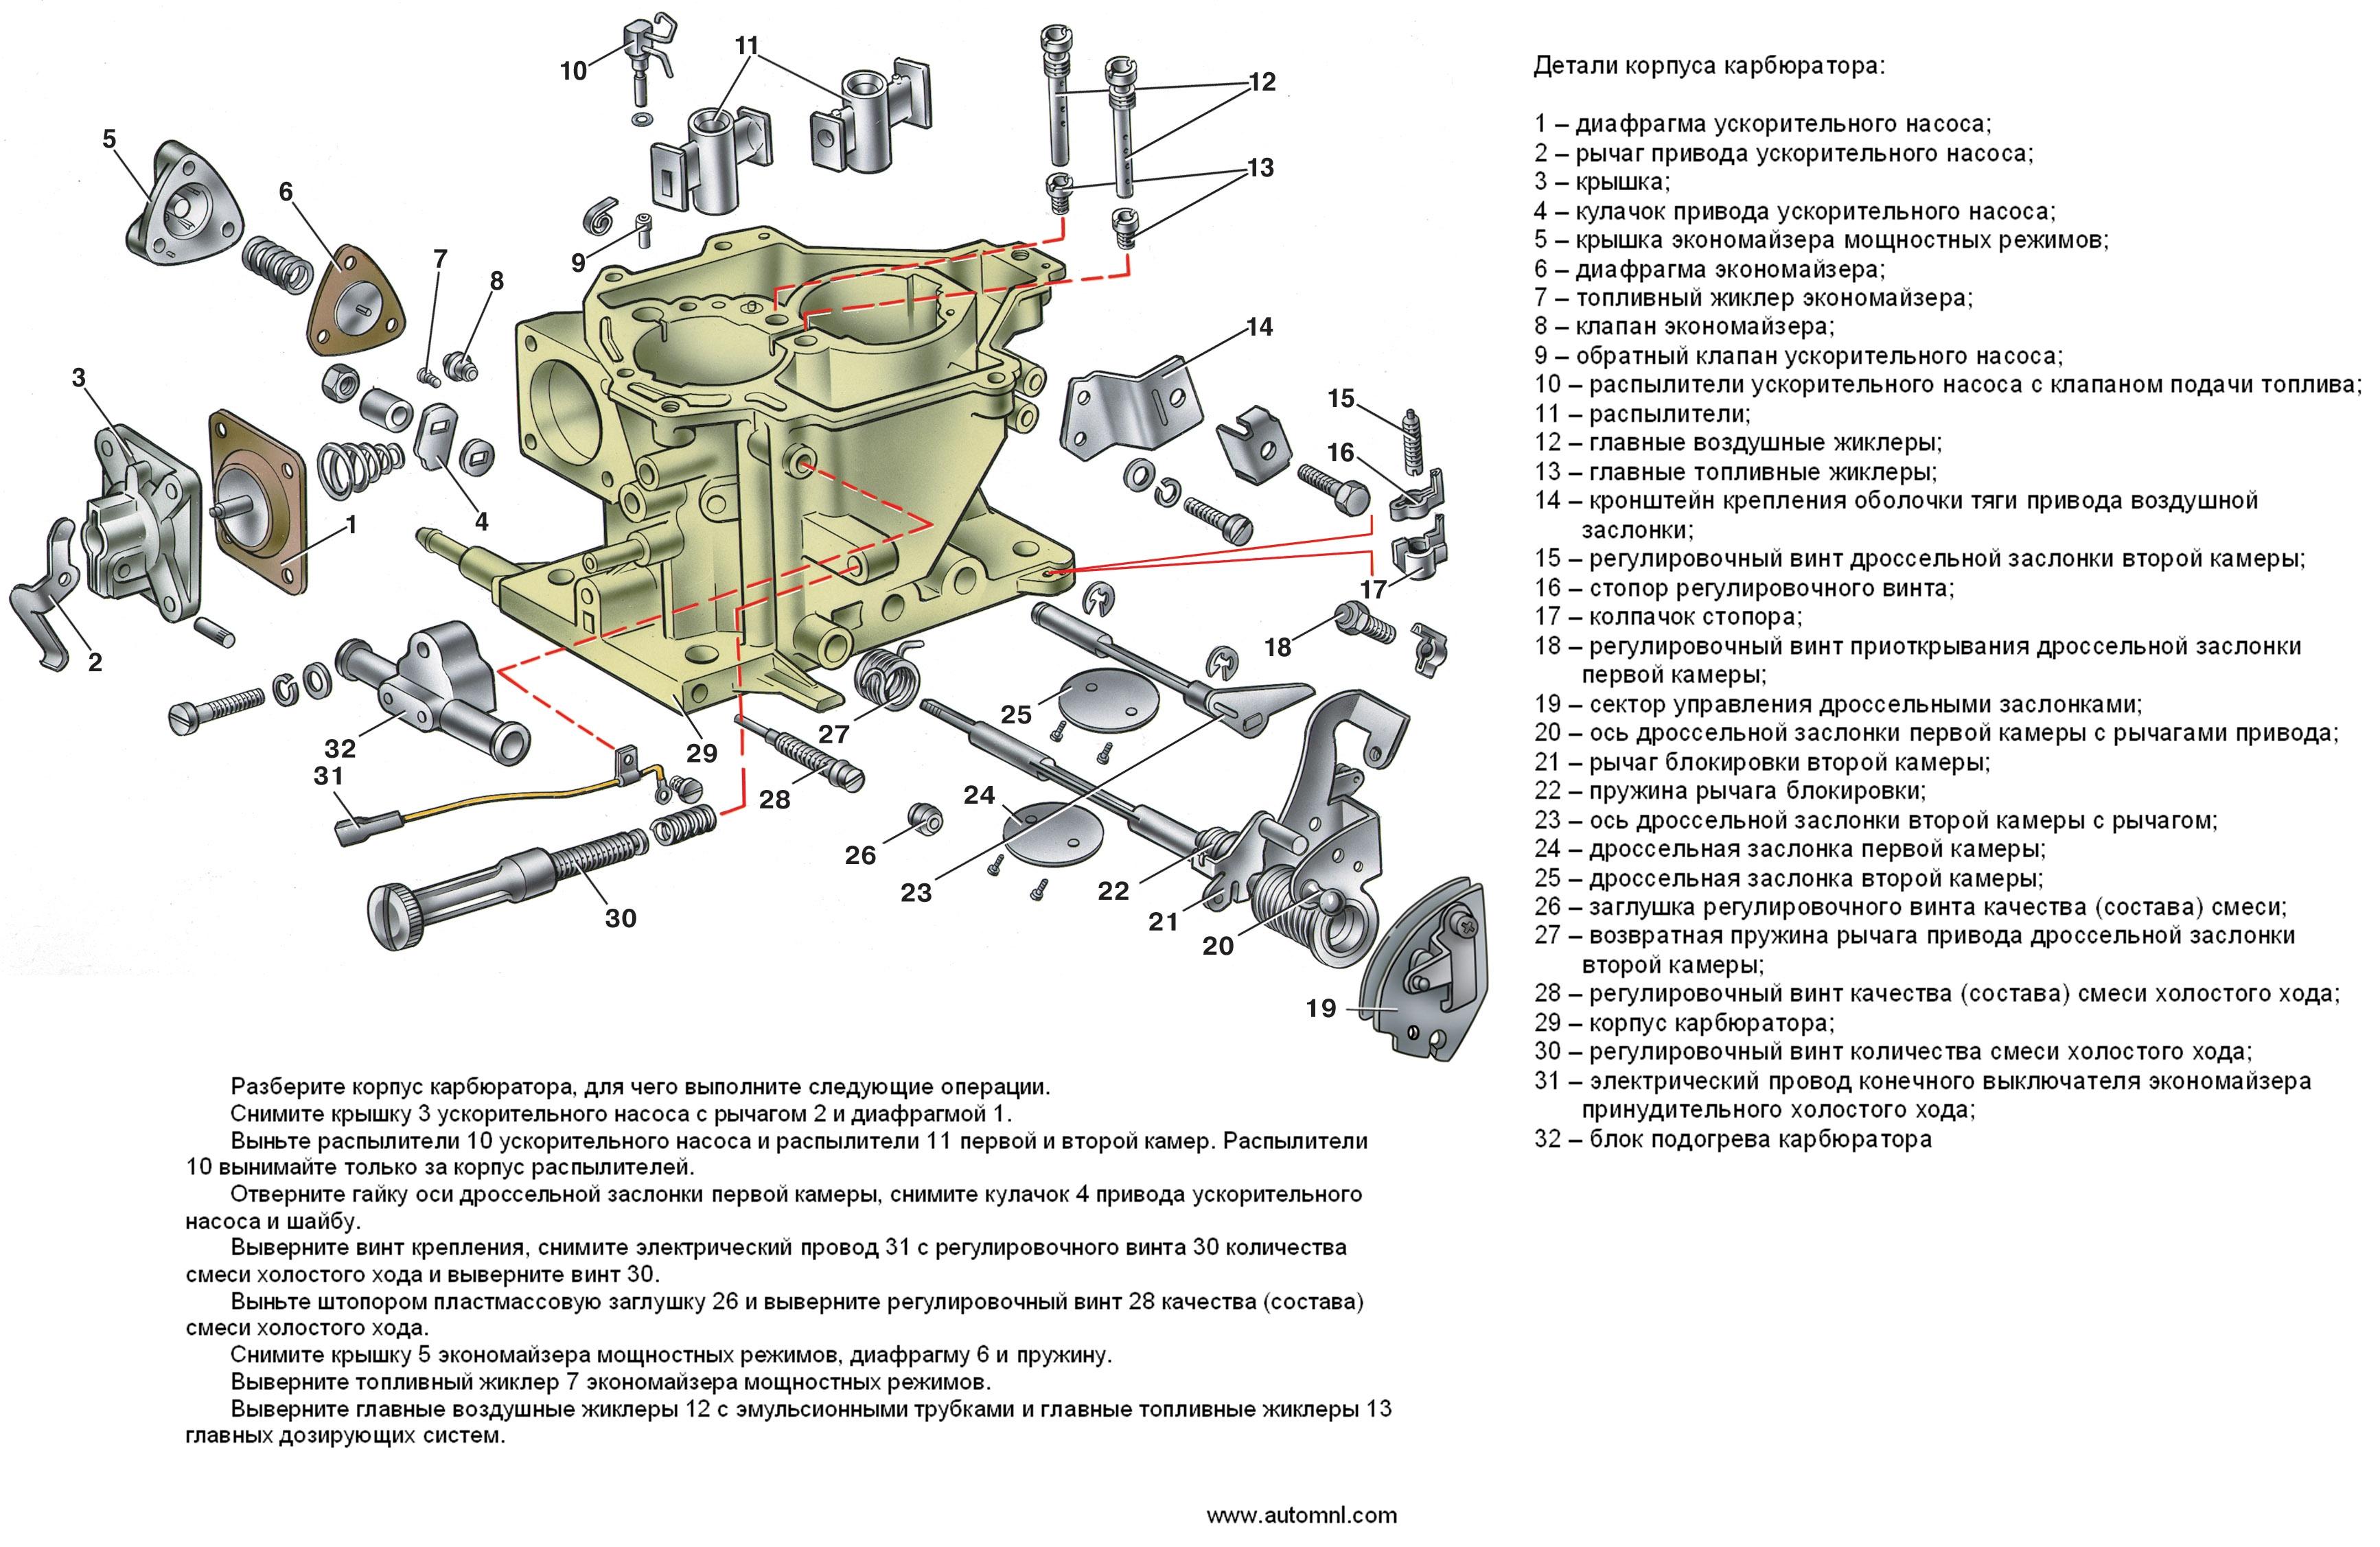 Руководство по ремонту ваз 2109 карбюратор